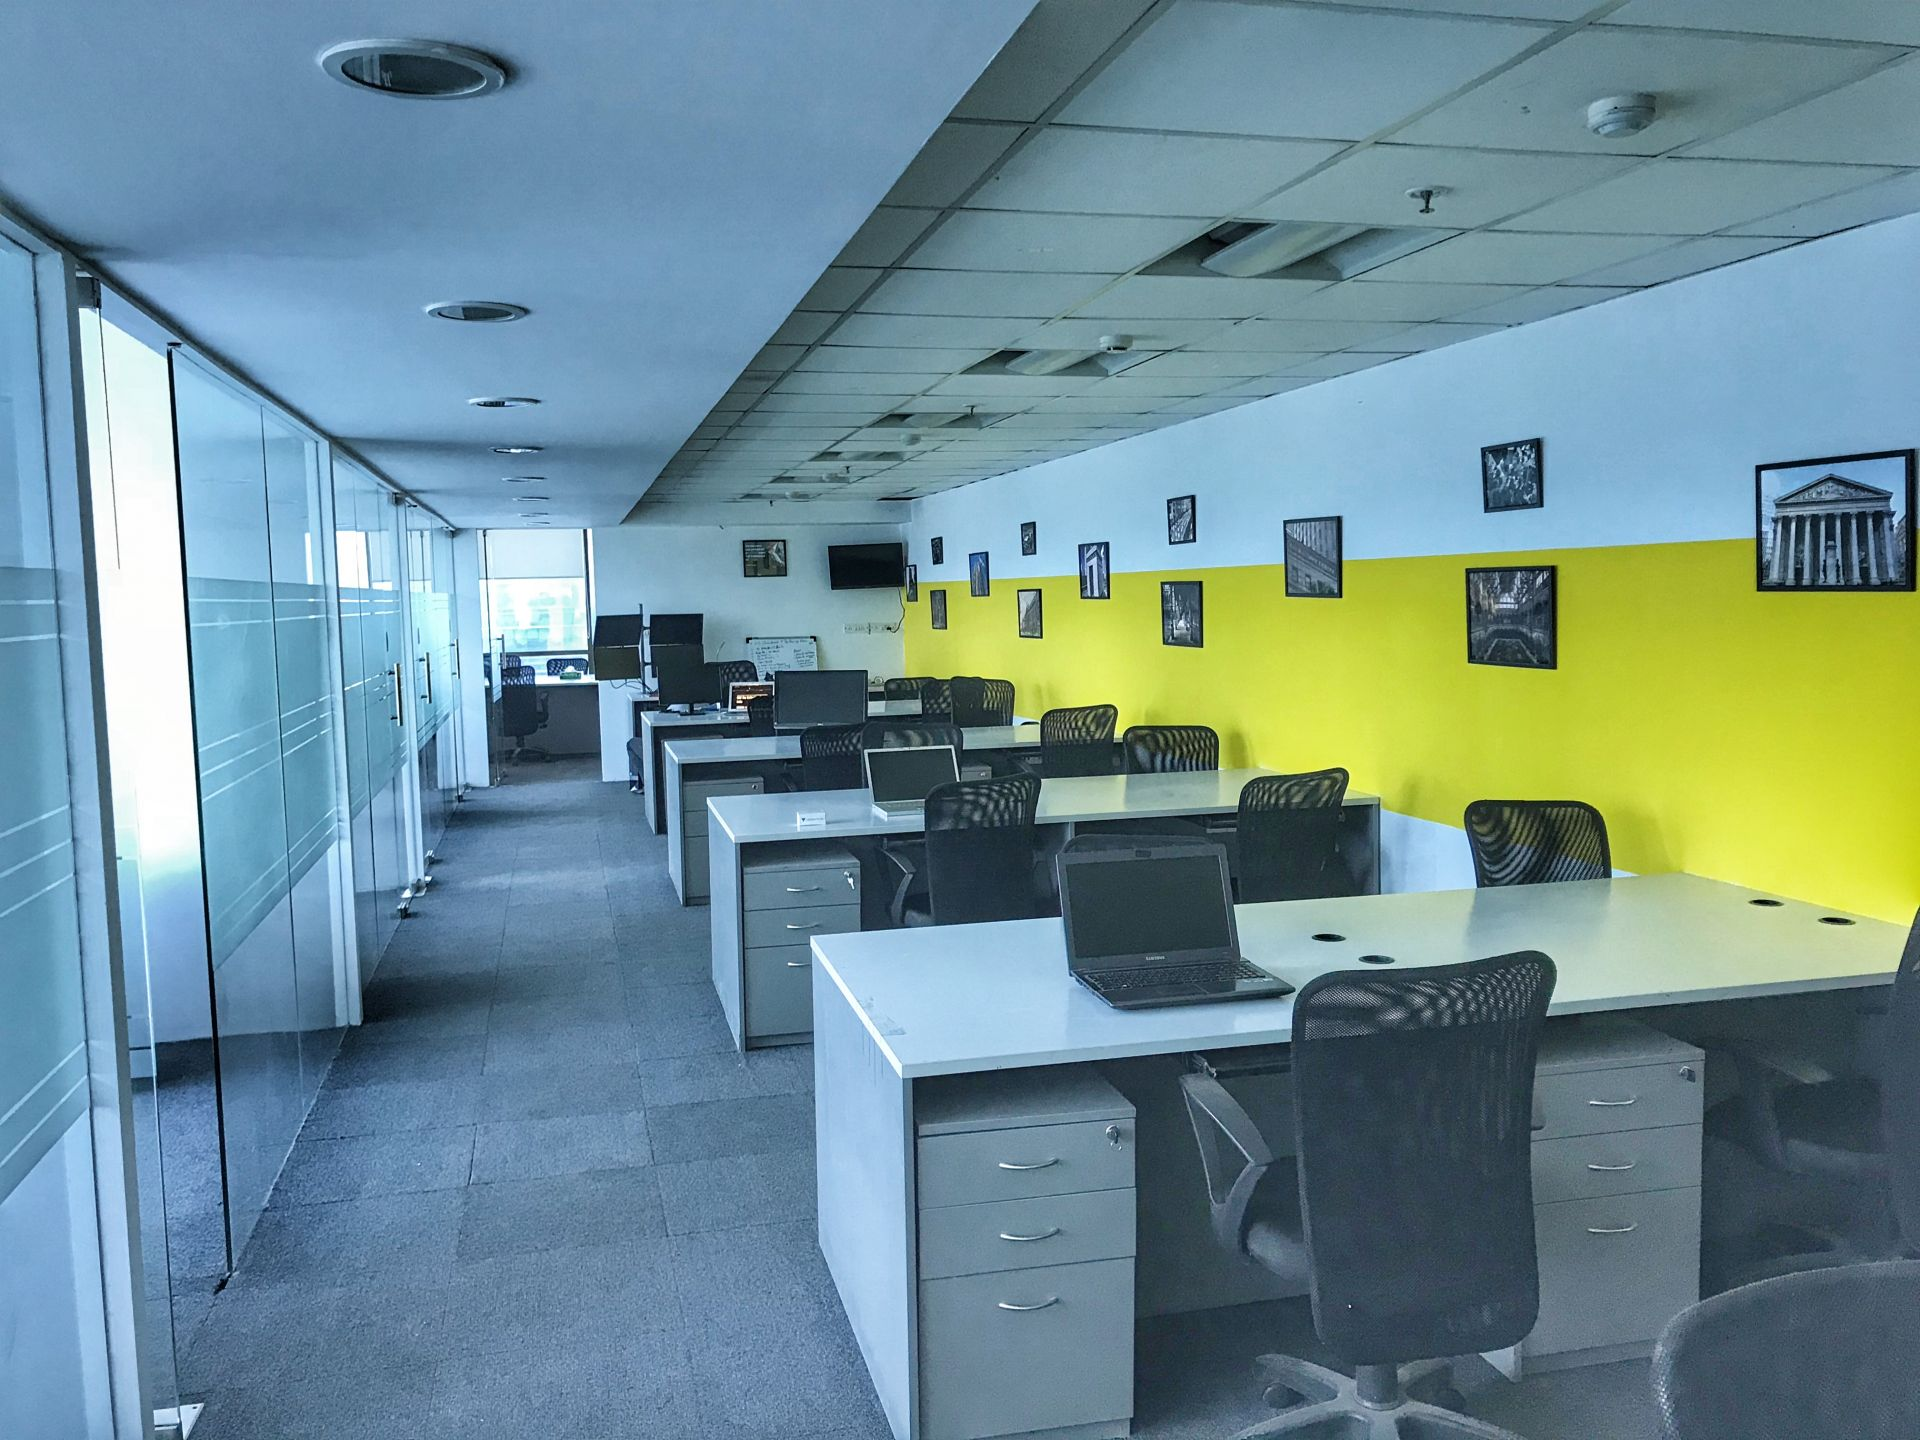 603 the CoWorking Space Powai, Mumbai